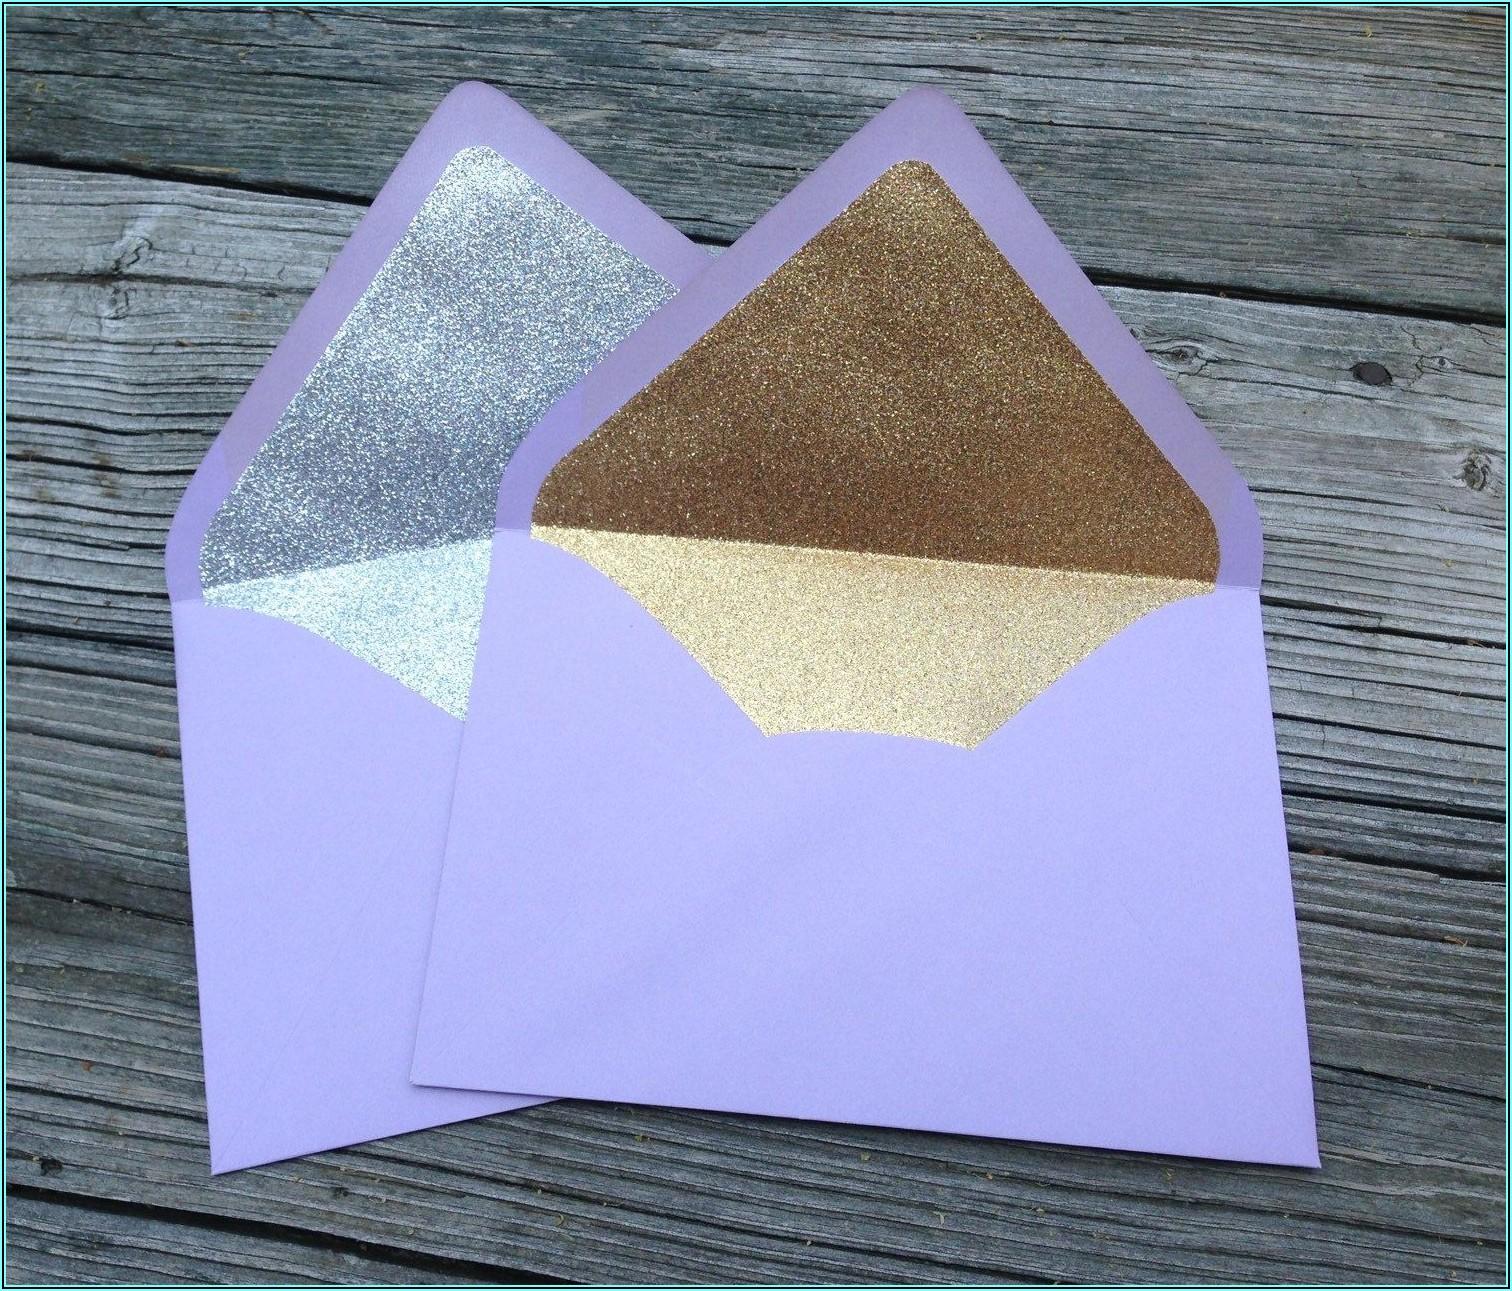 Paper Source 5x7 Envelopes